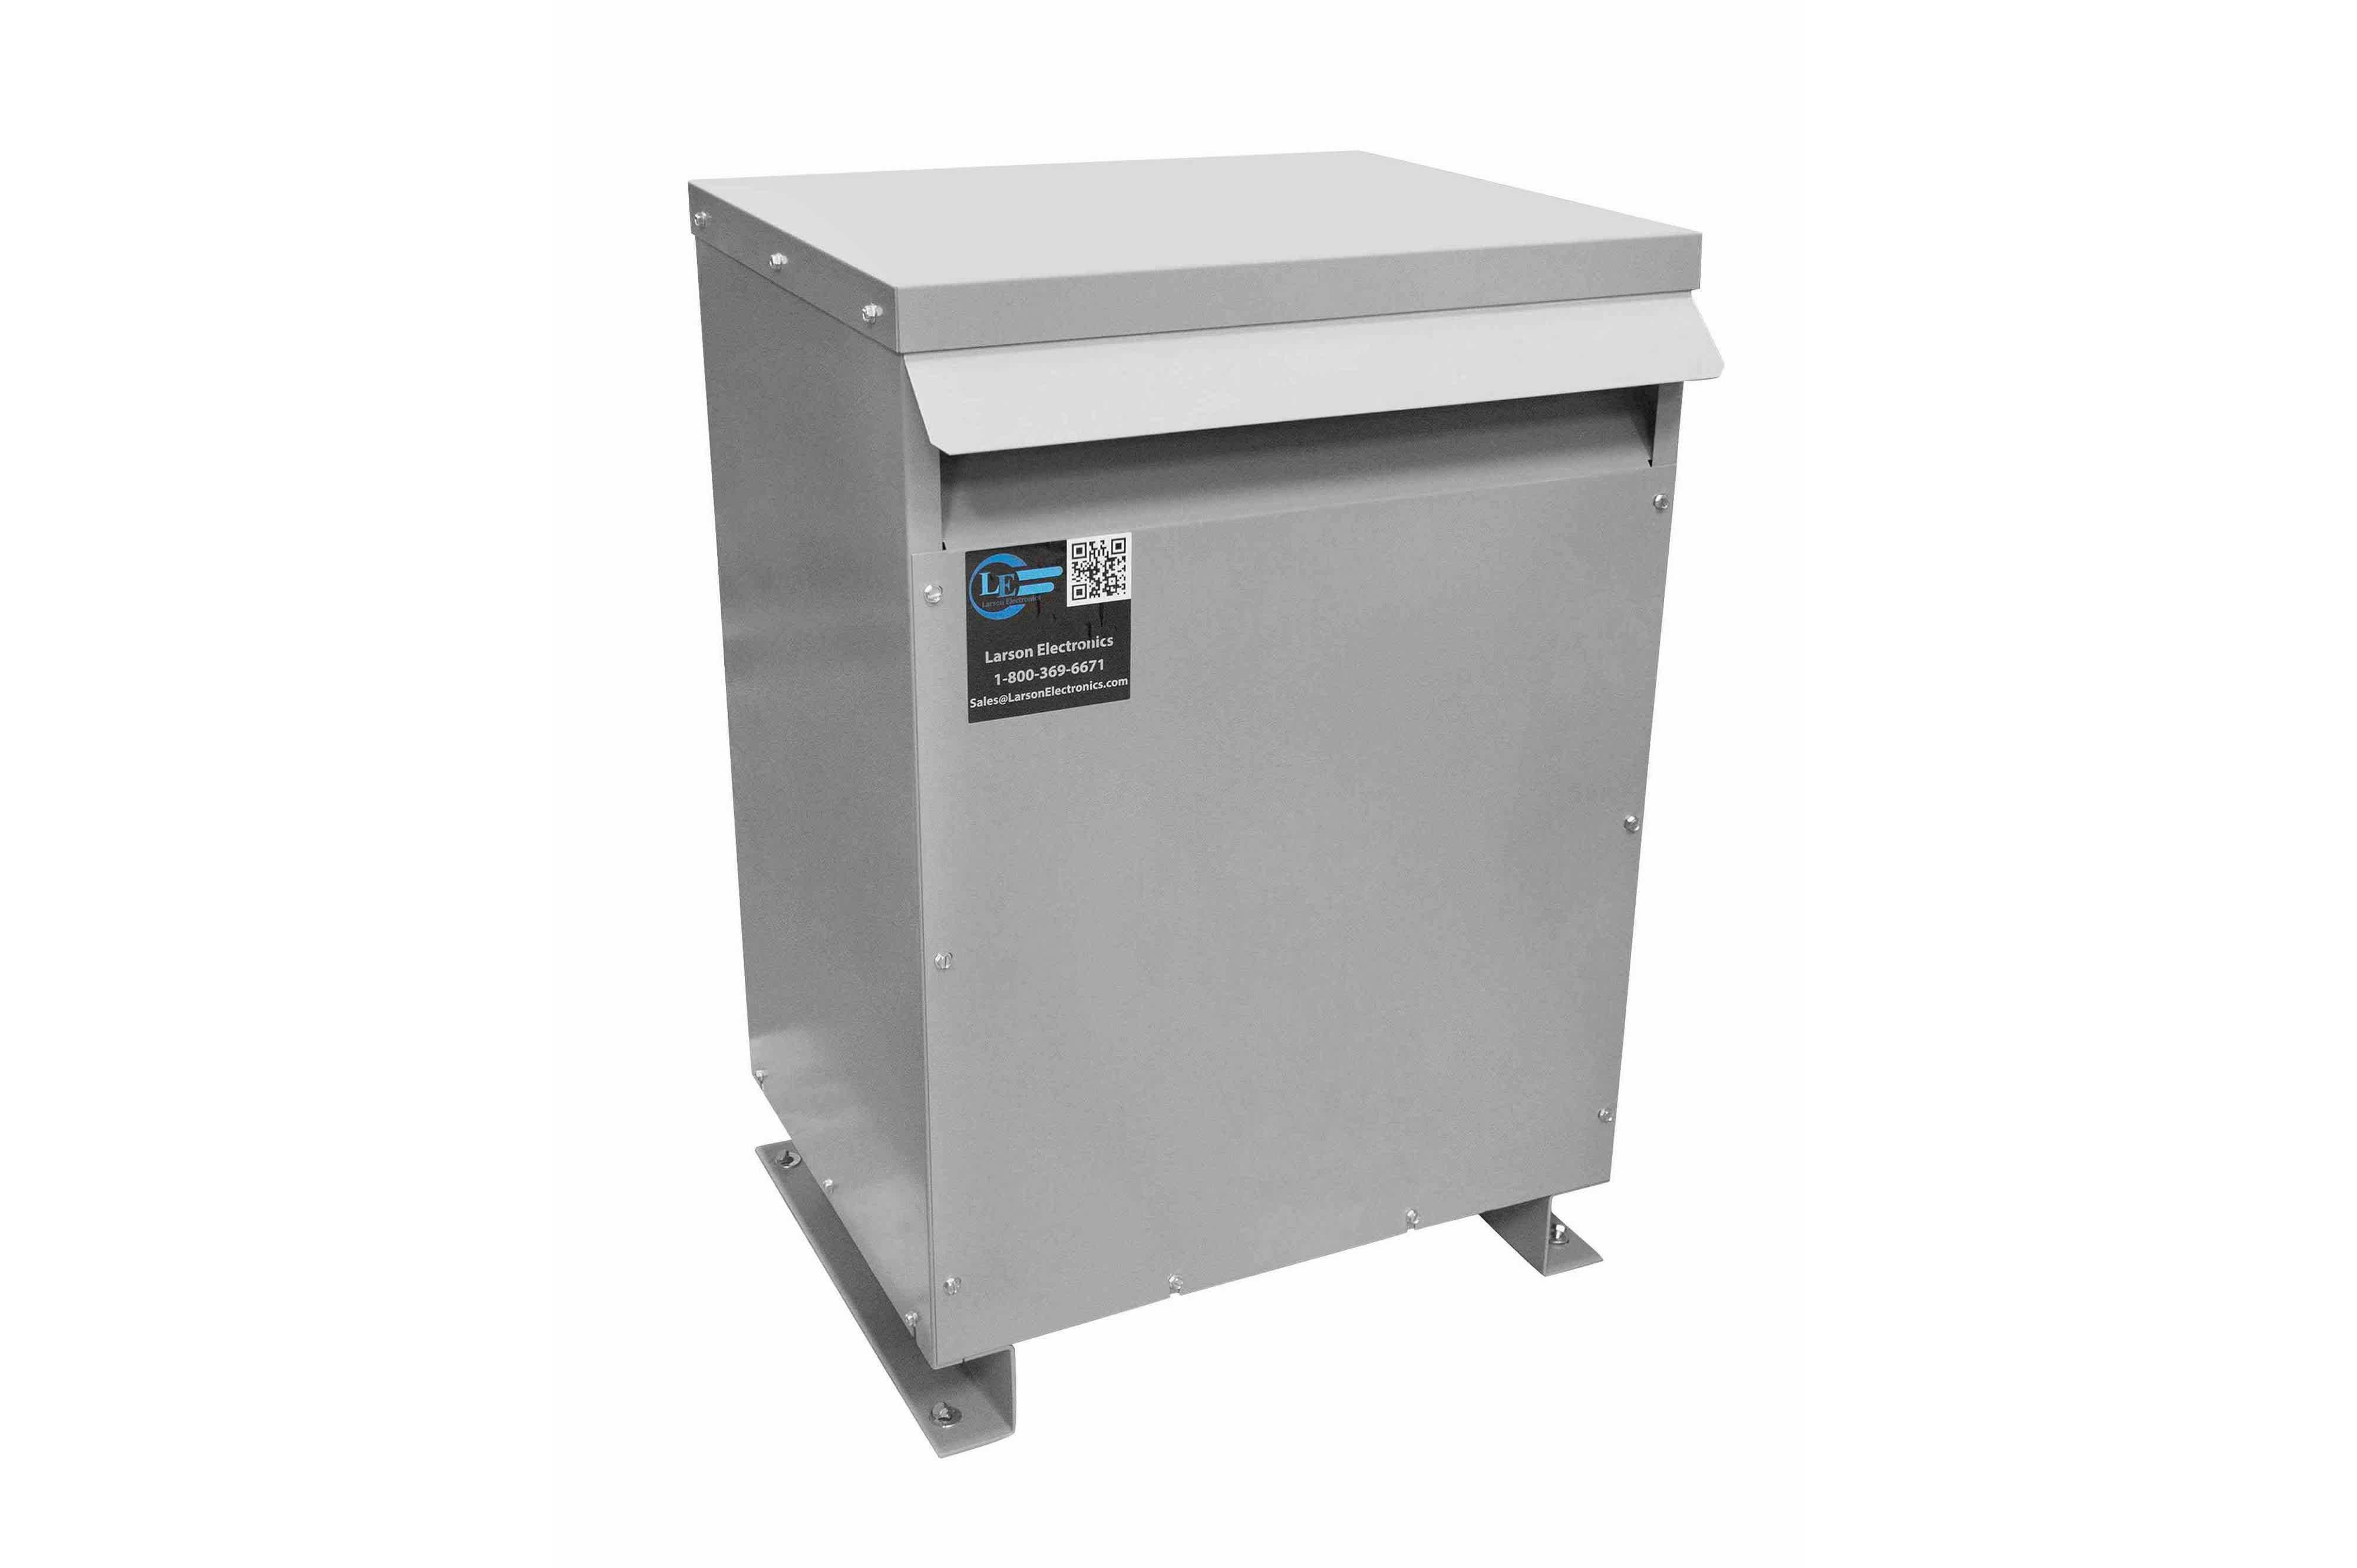 175 kVA 3PH Isolation Transformer, 208V Wye Primary, 480Y/277 Wye-N Secondary, N3R, Ventilated, 60 Hz